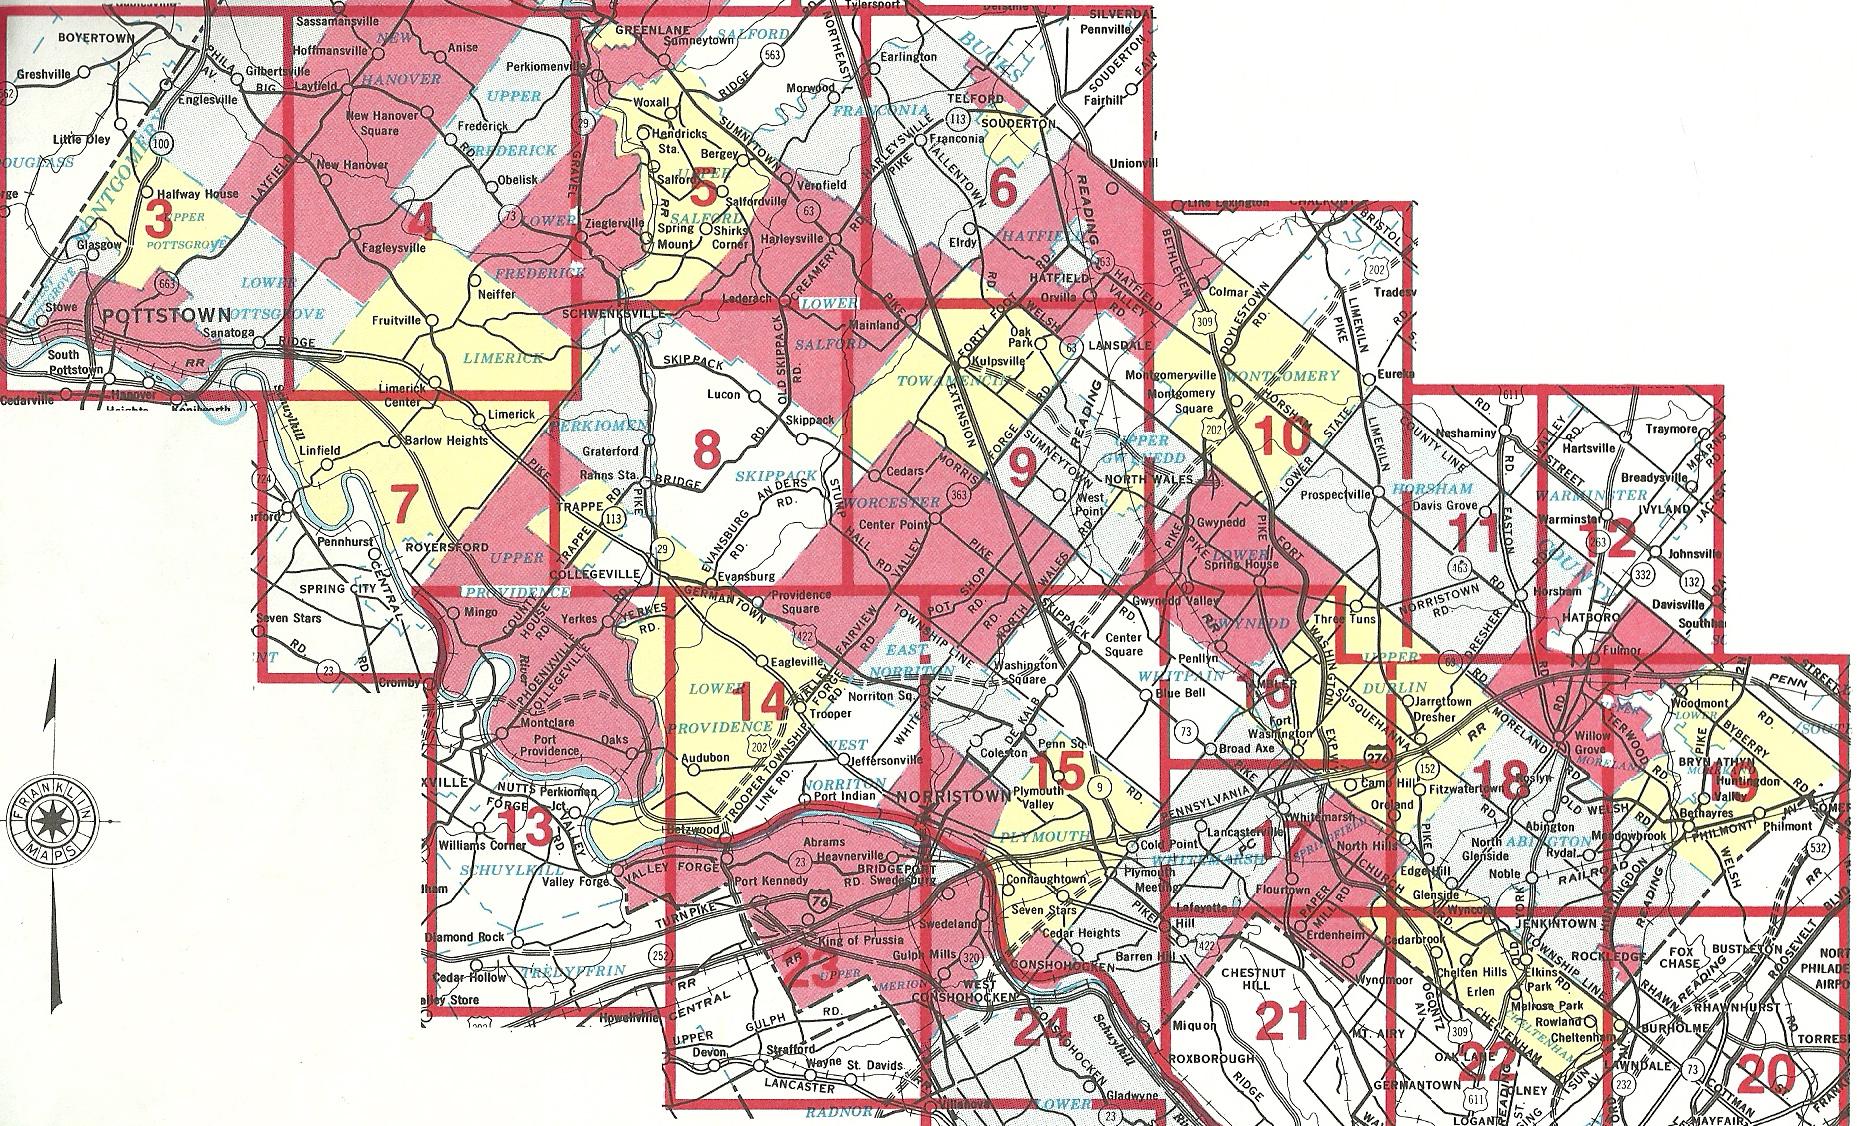 1991 Bucks County, PA Map Scans